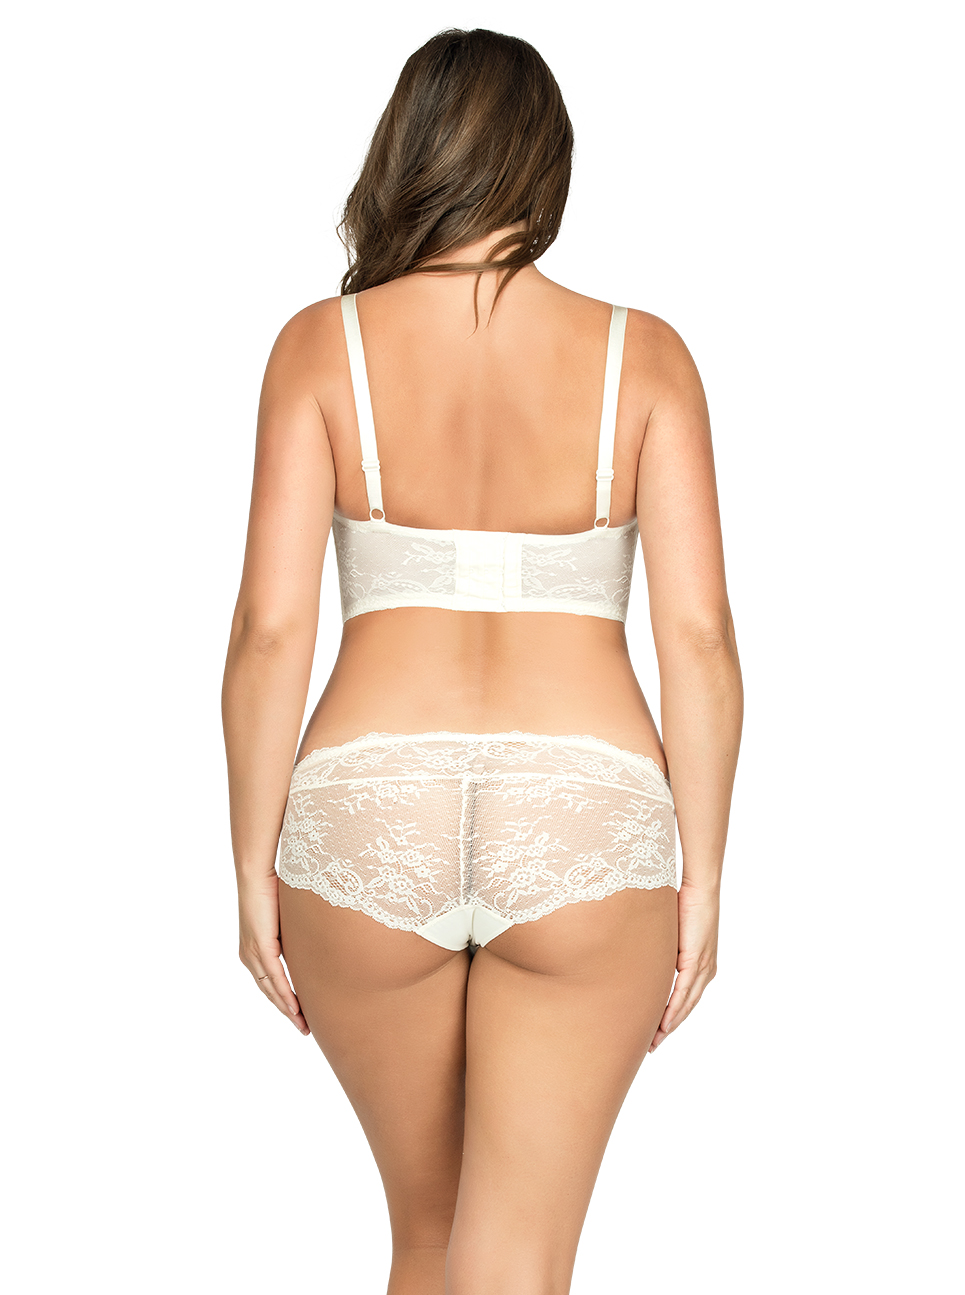 PARFAIT Sandrine PlungeLonglineBraP5351 HipsterP5355 Ivory Back - Sandrine Hipster - Ivory - P5355